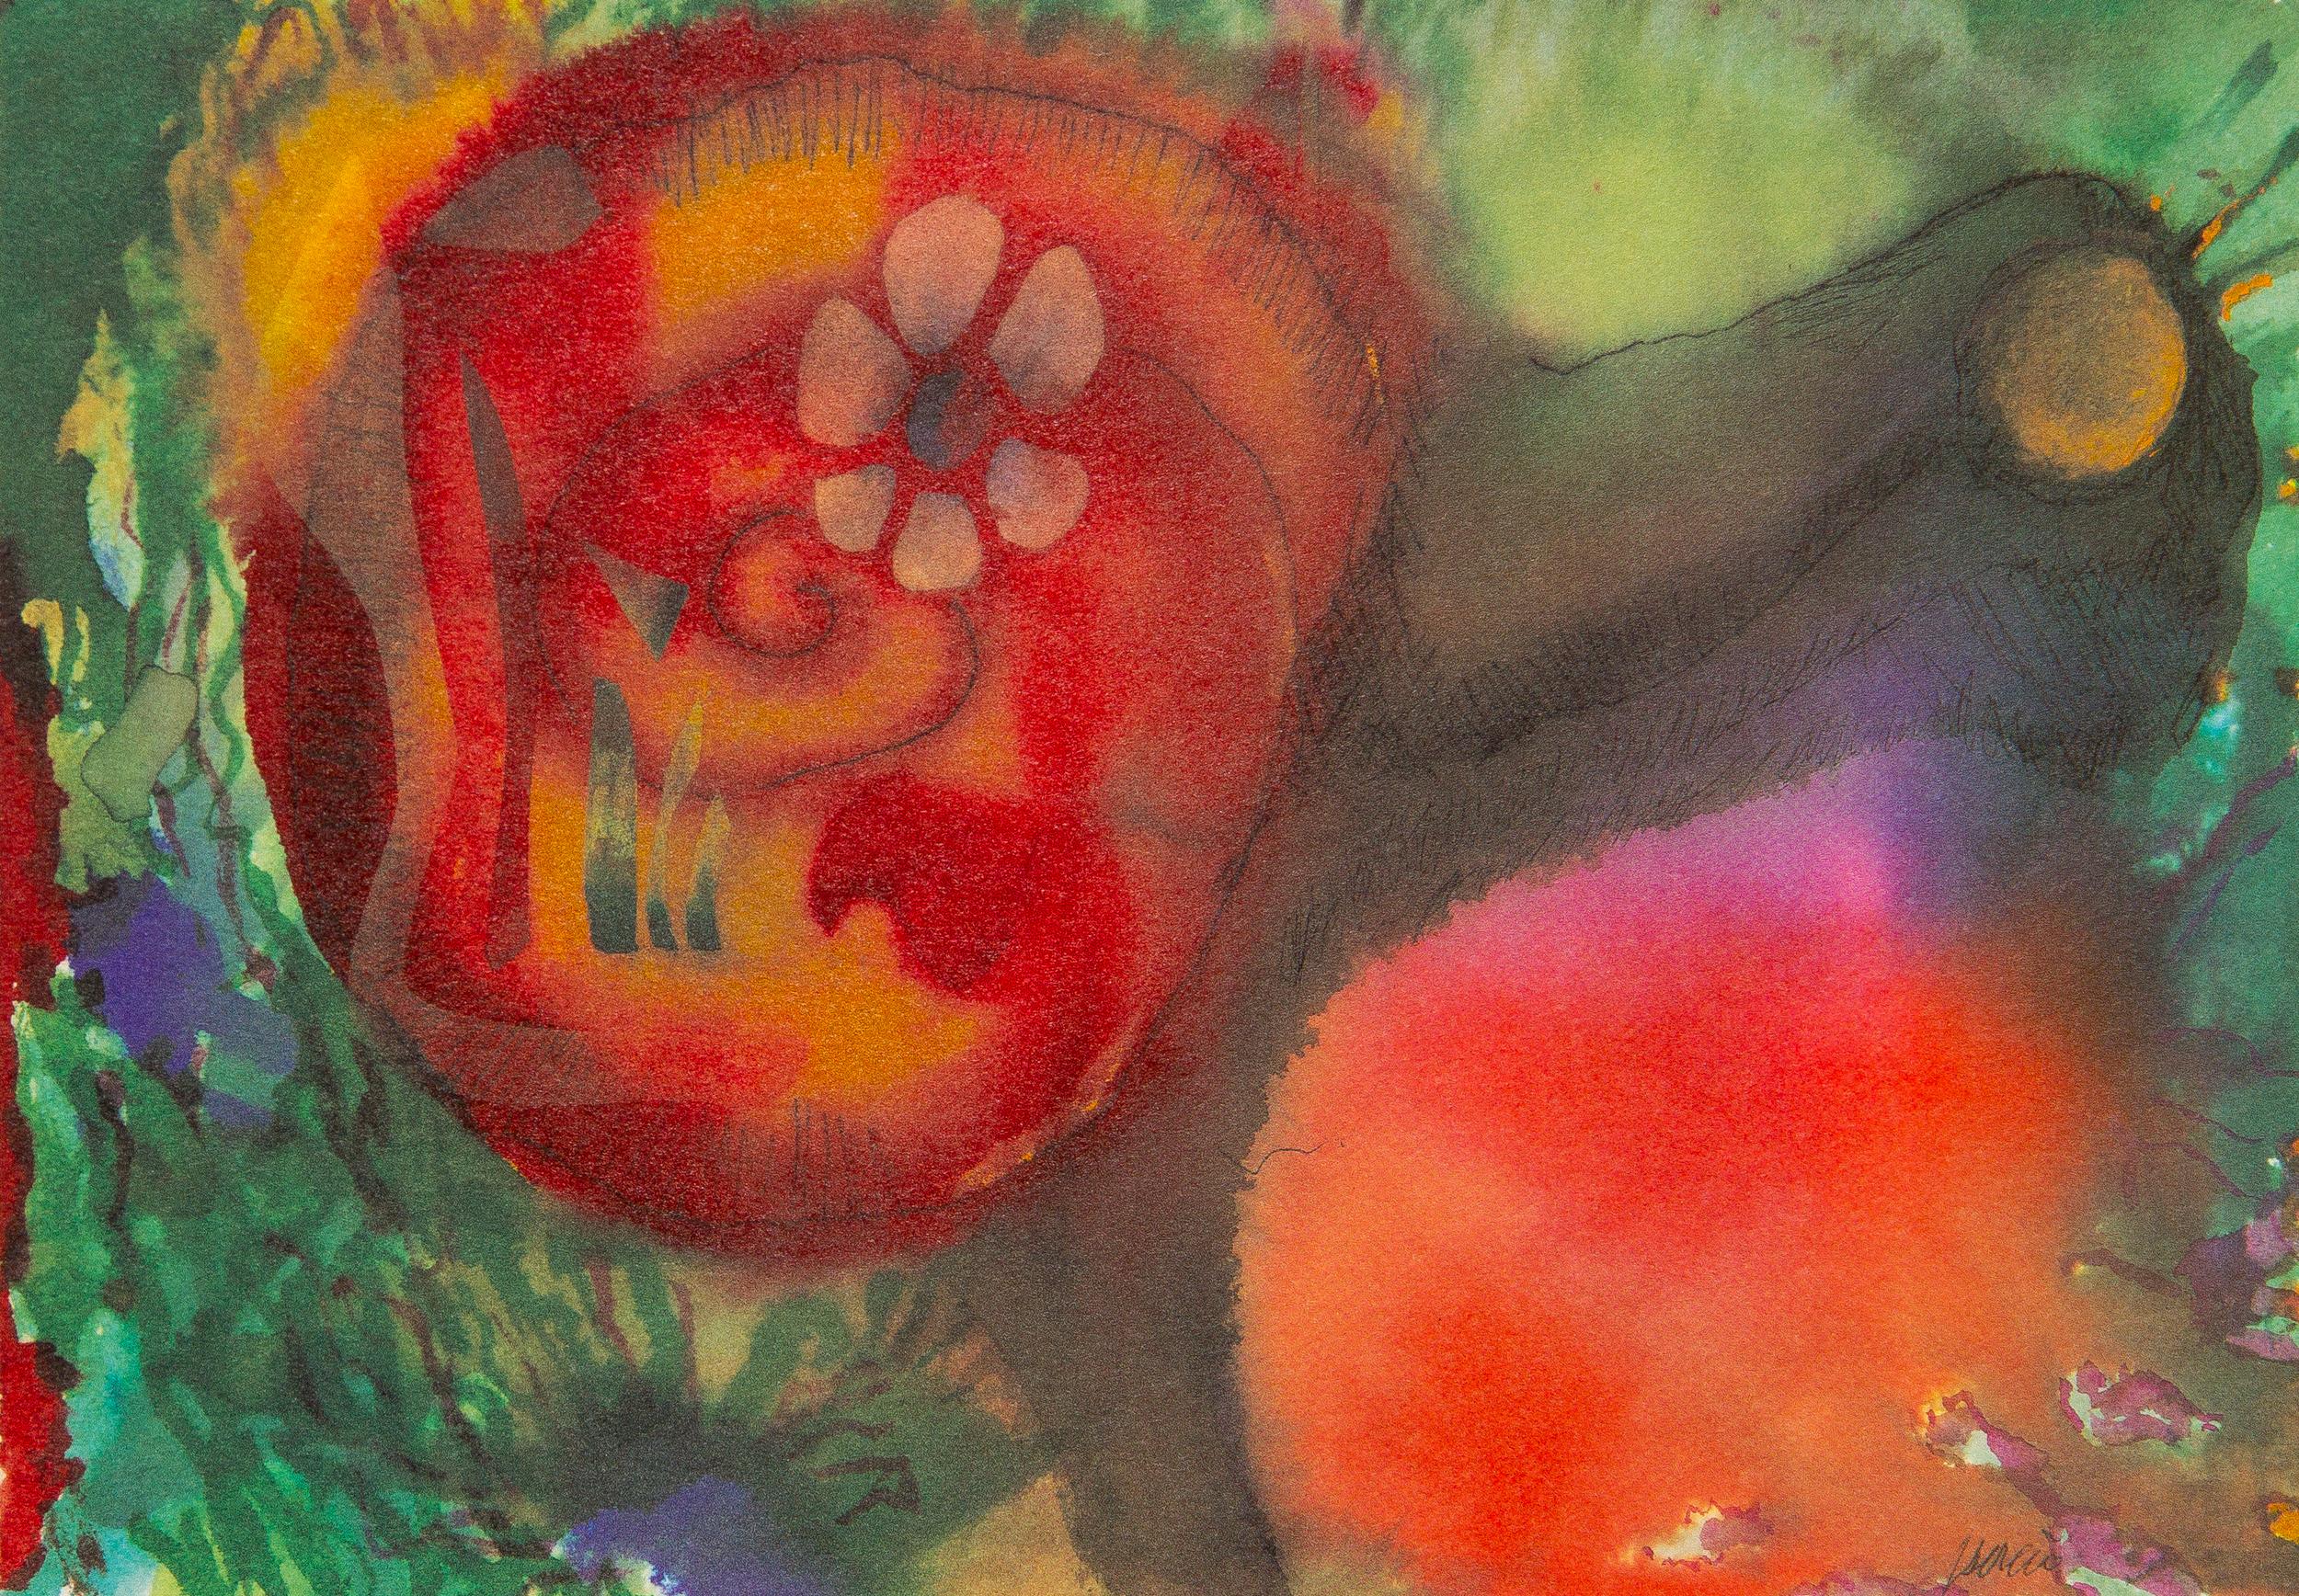 Snail Garden by Jerry Garcia